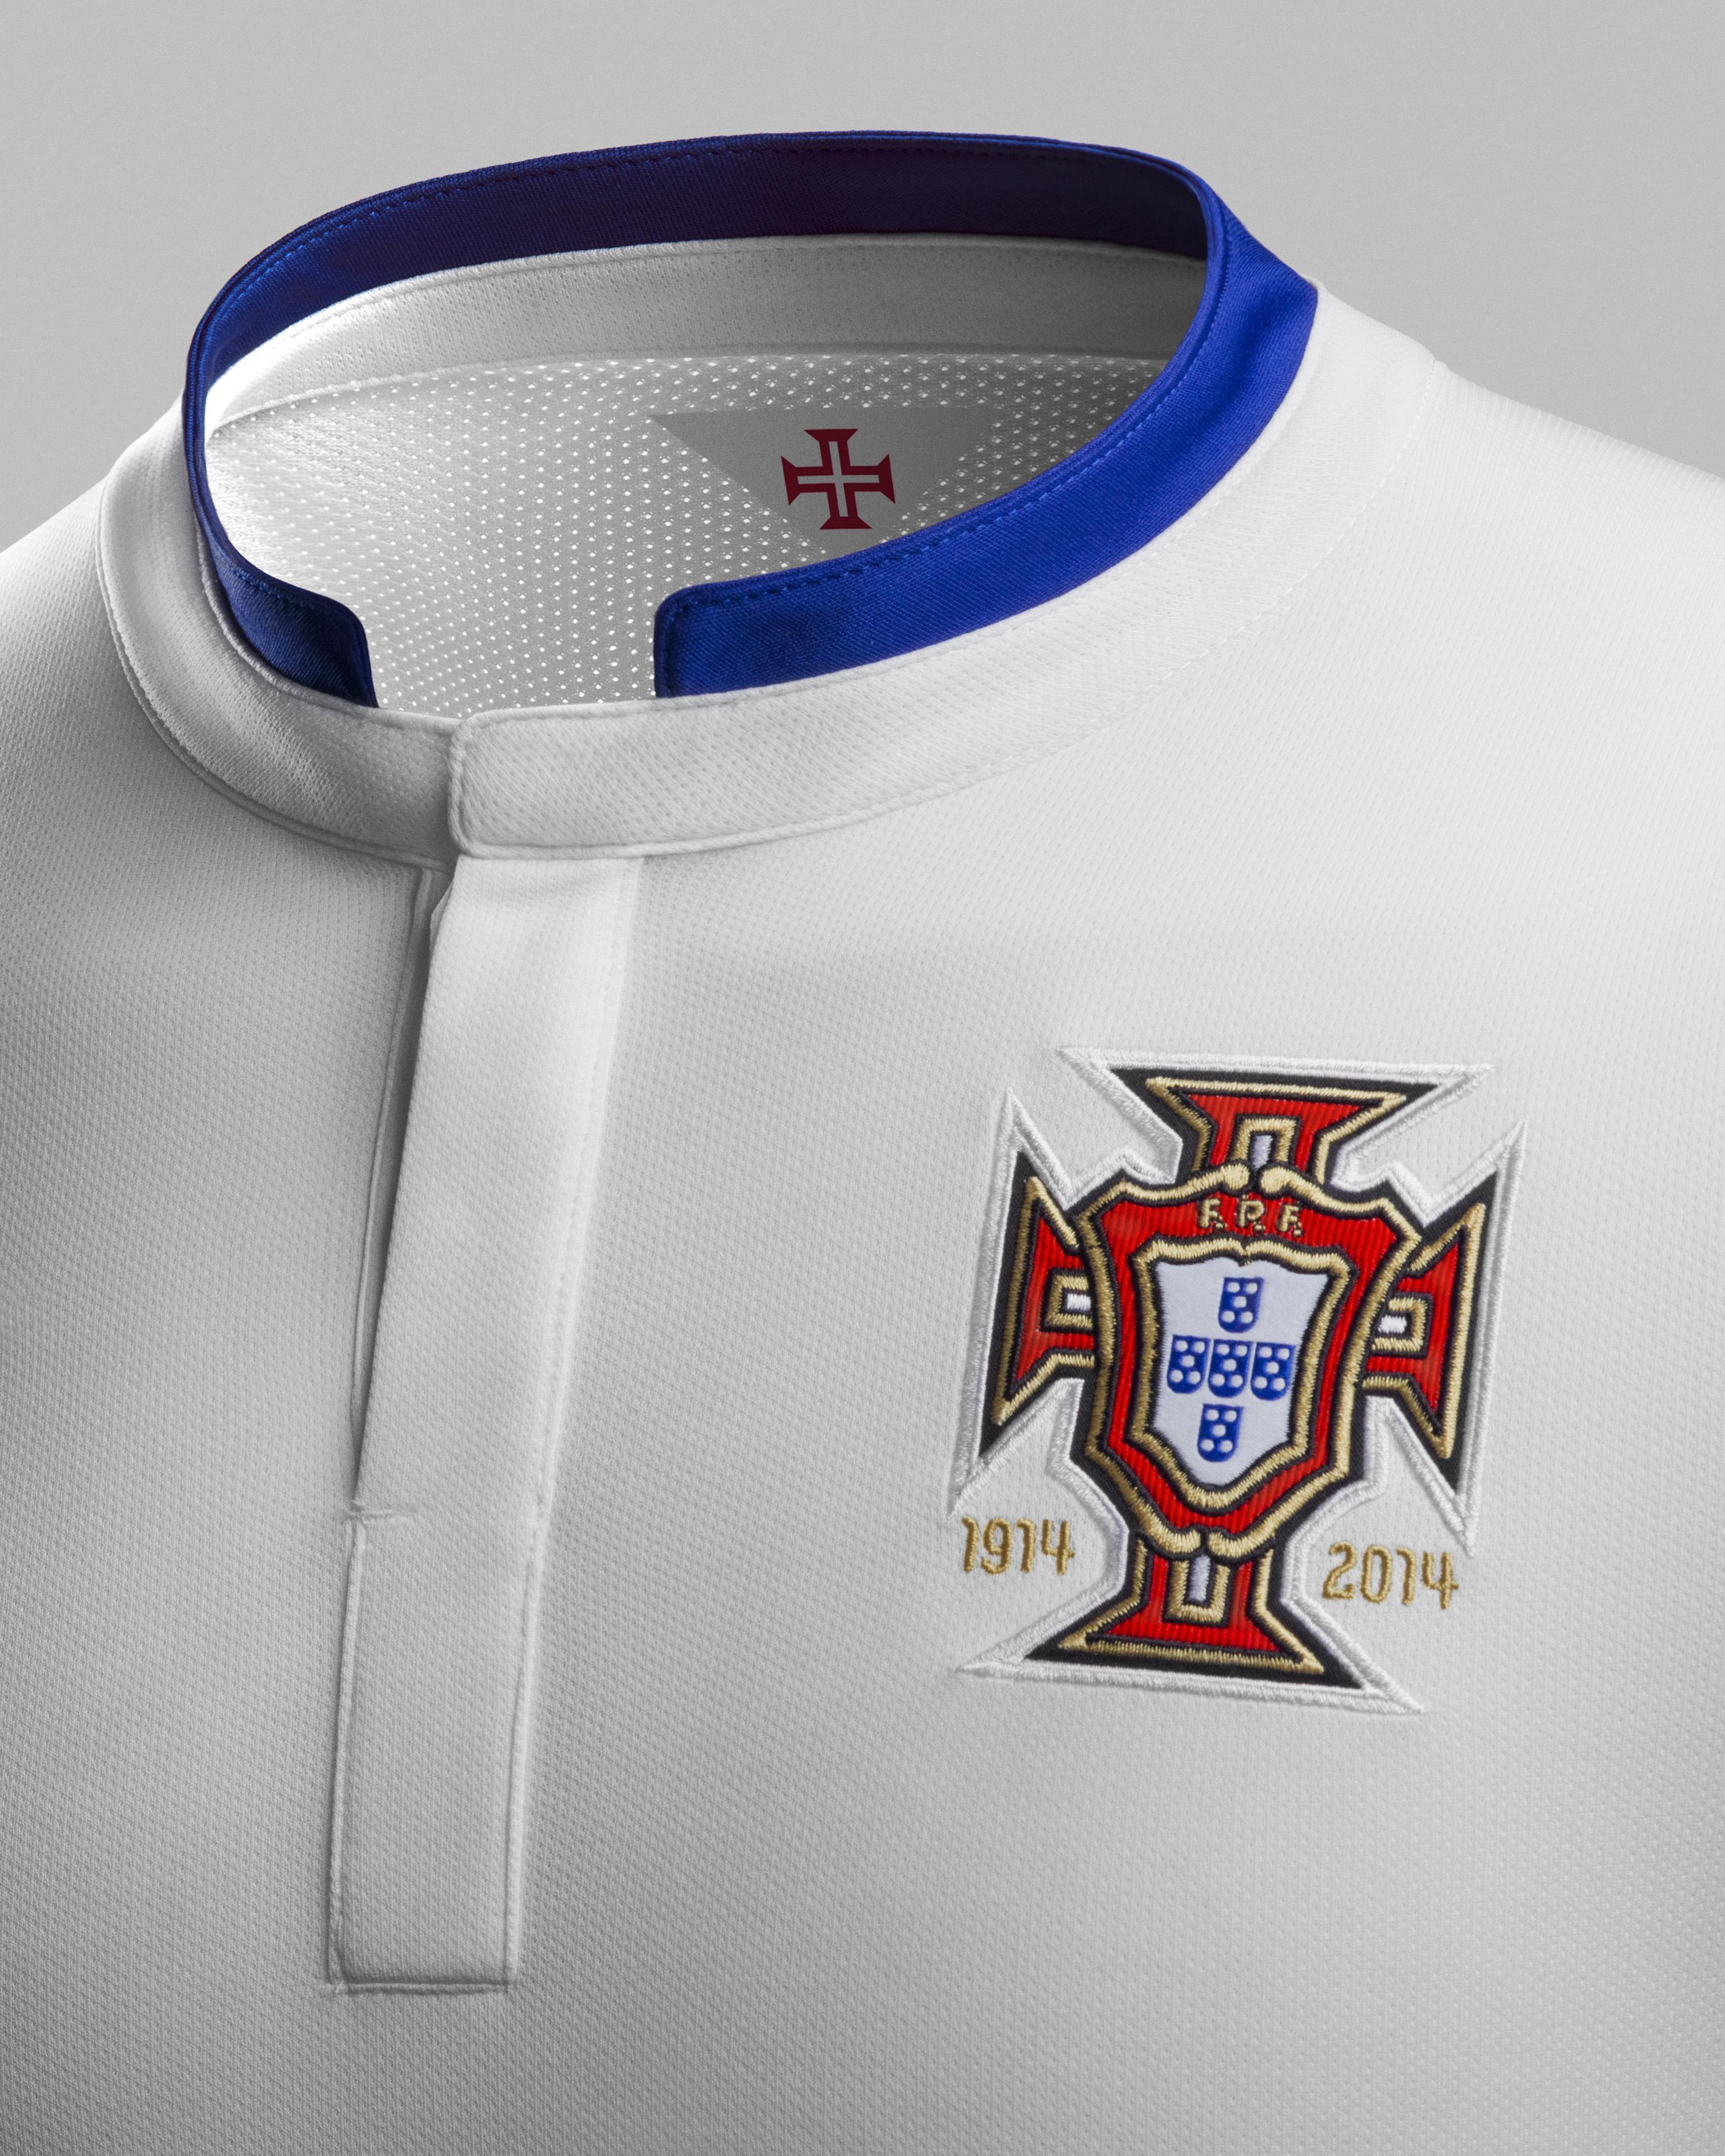 fa3008af7 Portugal World Cup 2014 Away Kit